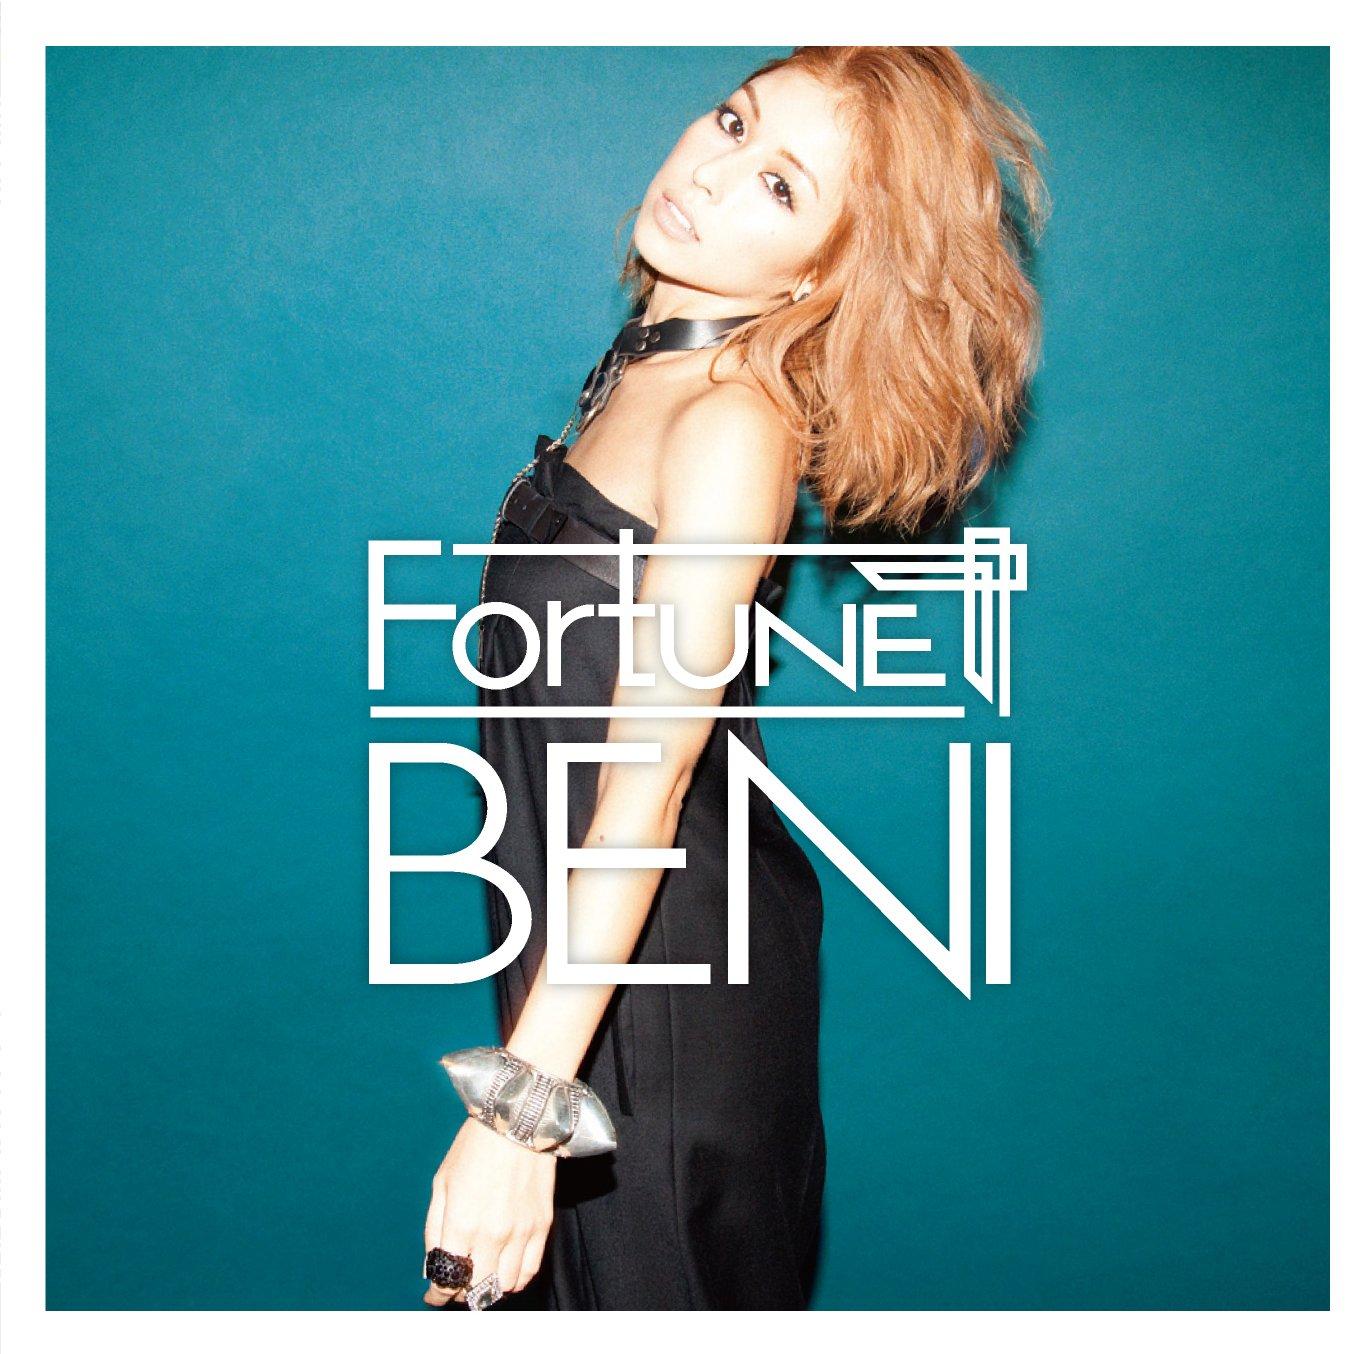 20190314.0218.03 BENI - Fortune (DVD) cover 2.jpg